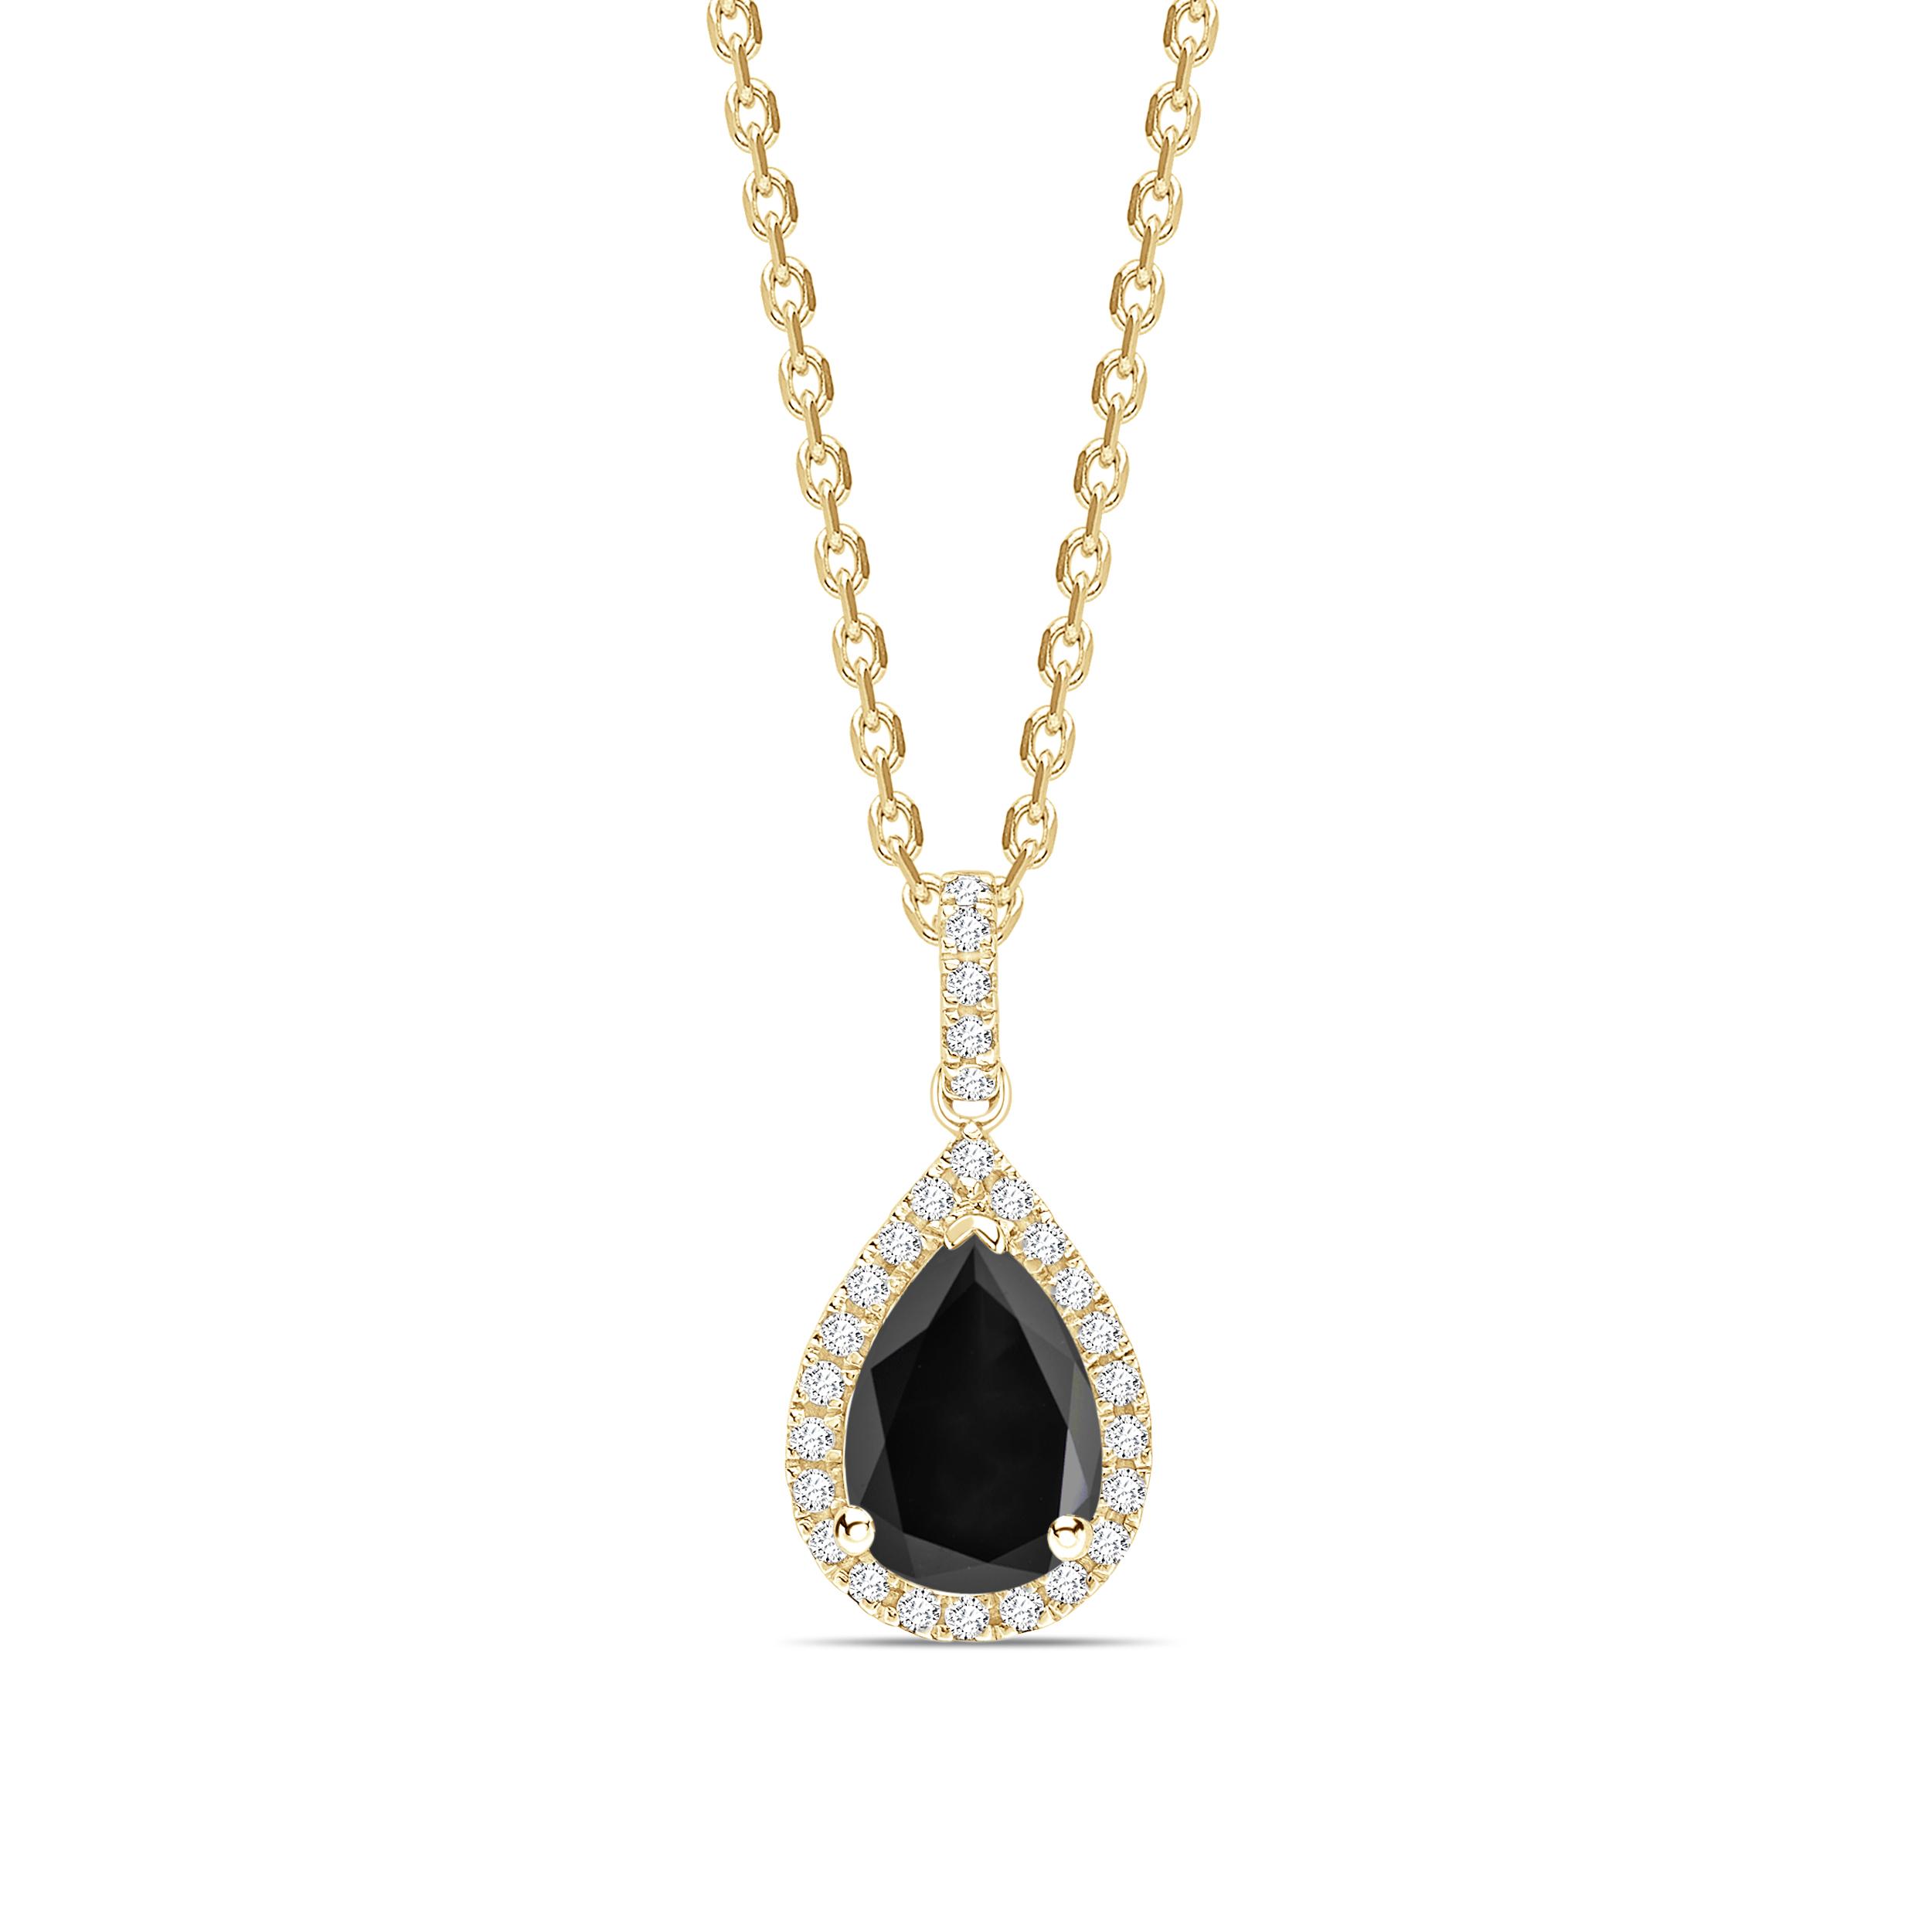 Halo Style Pear Cut Black Diamond Solitaire Pendants Necklace